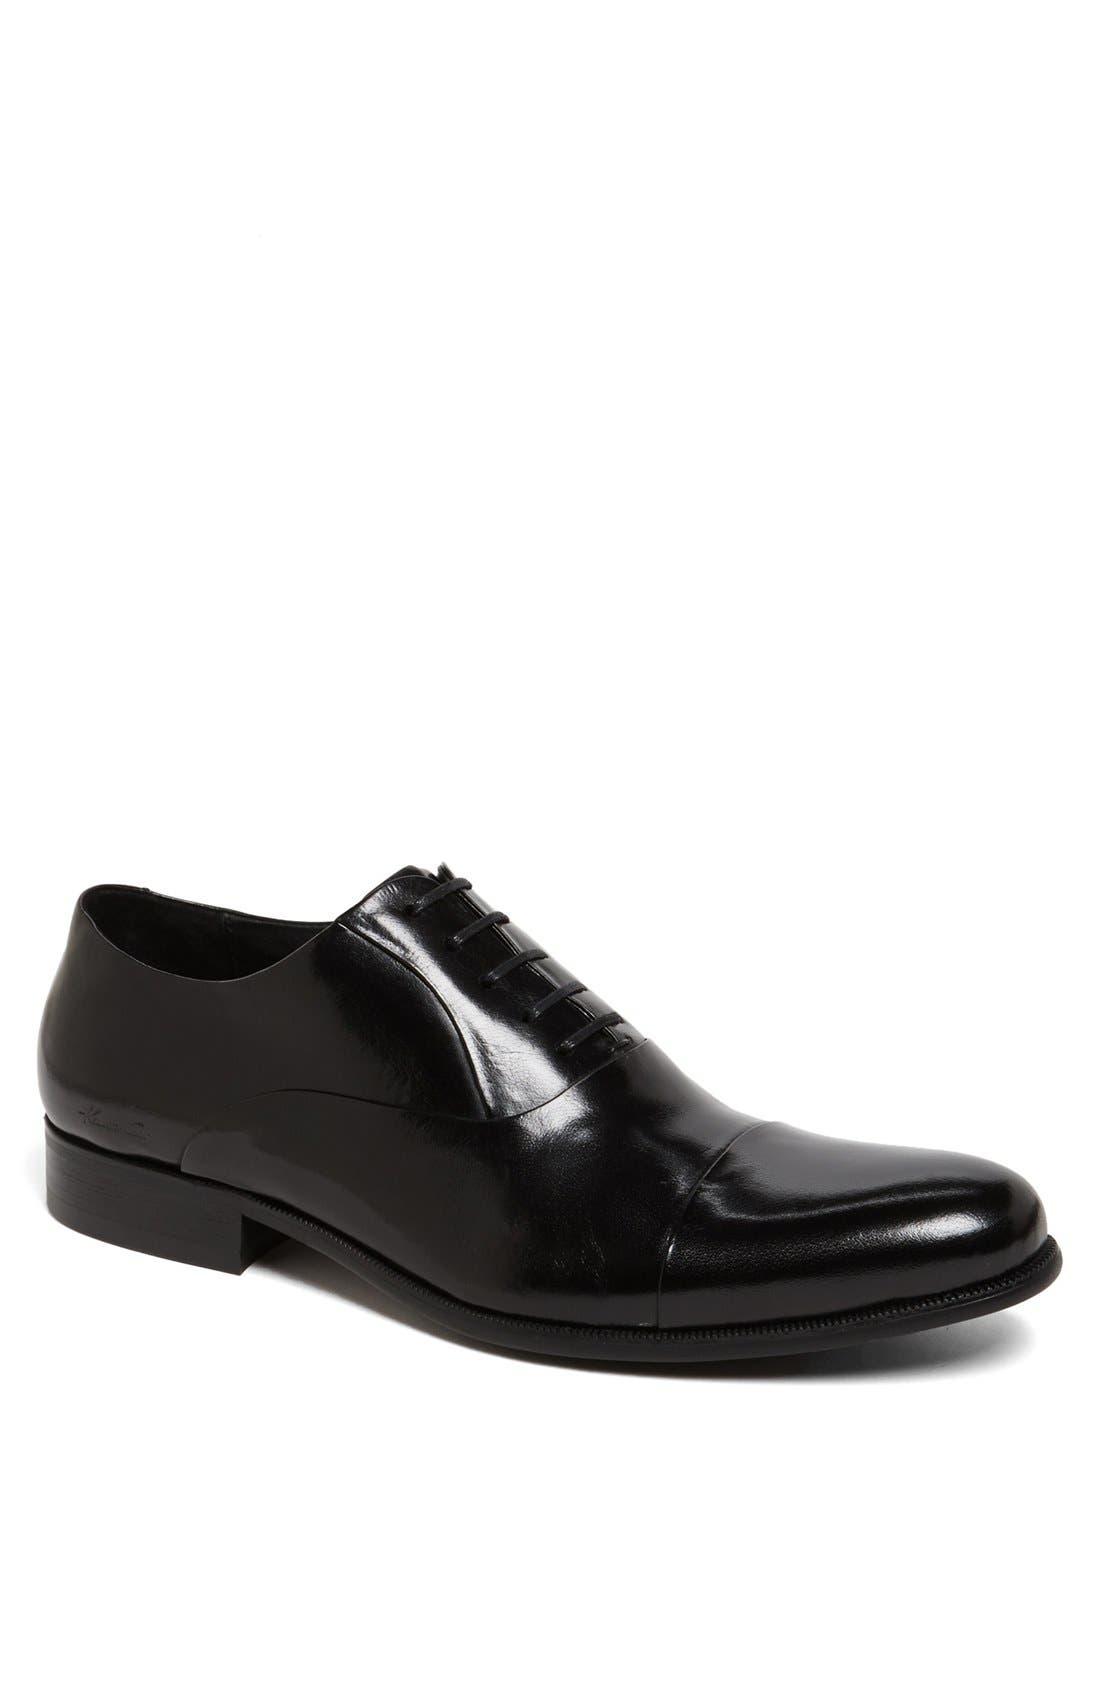 'Chief Council' Cap Toe Oxford,                         Main,                         color, Black